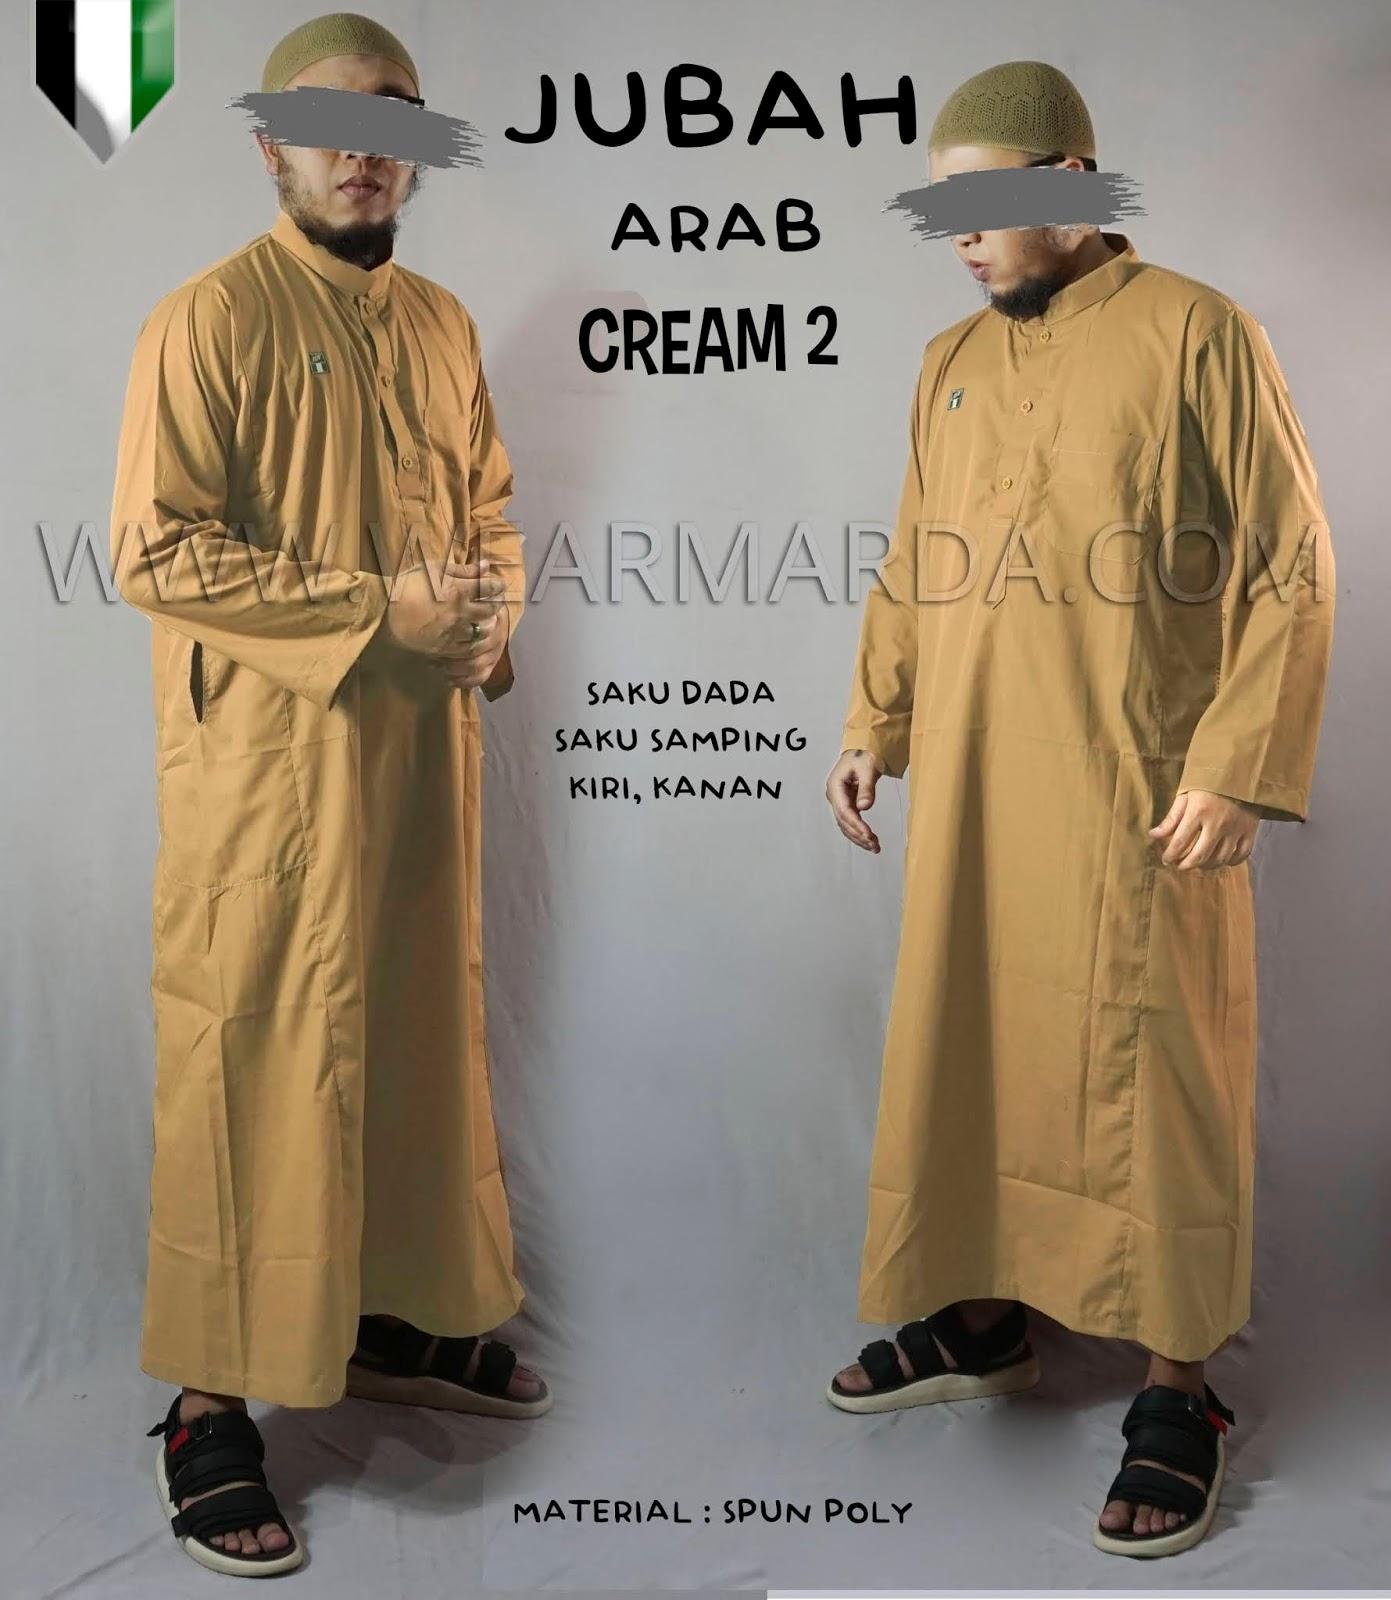 JUBAH ARAB CREAM 2